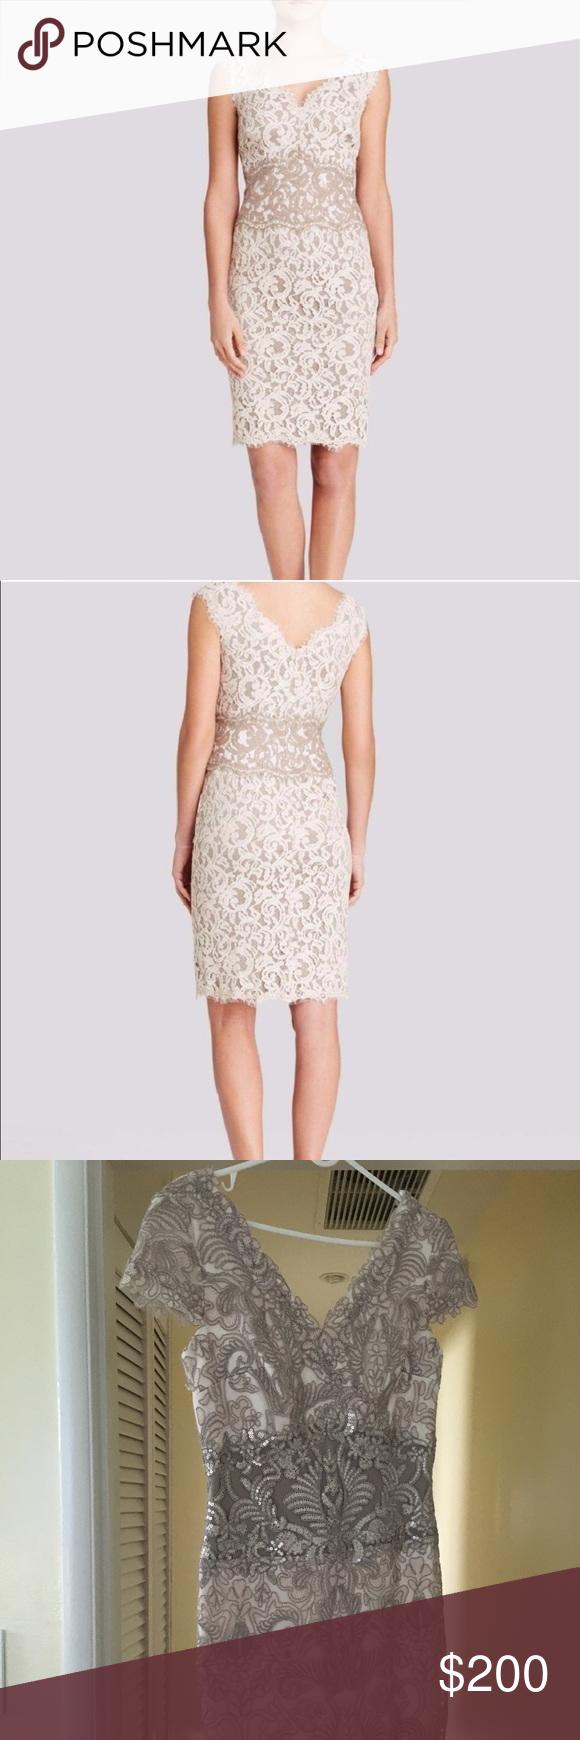 Tadashi Shoji Two Tone Lace Midi Dress Lace Midi Dress Tadashi Shoji Dresses Midi Dress [ 1740 x 580 Pixel ]